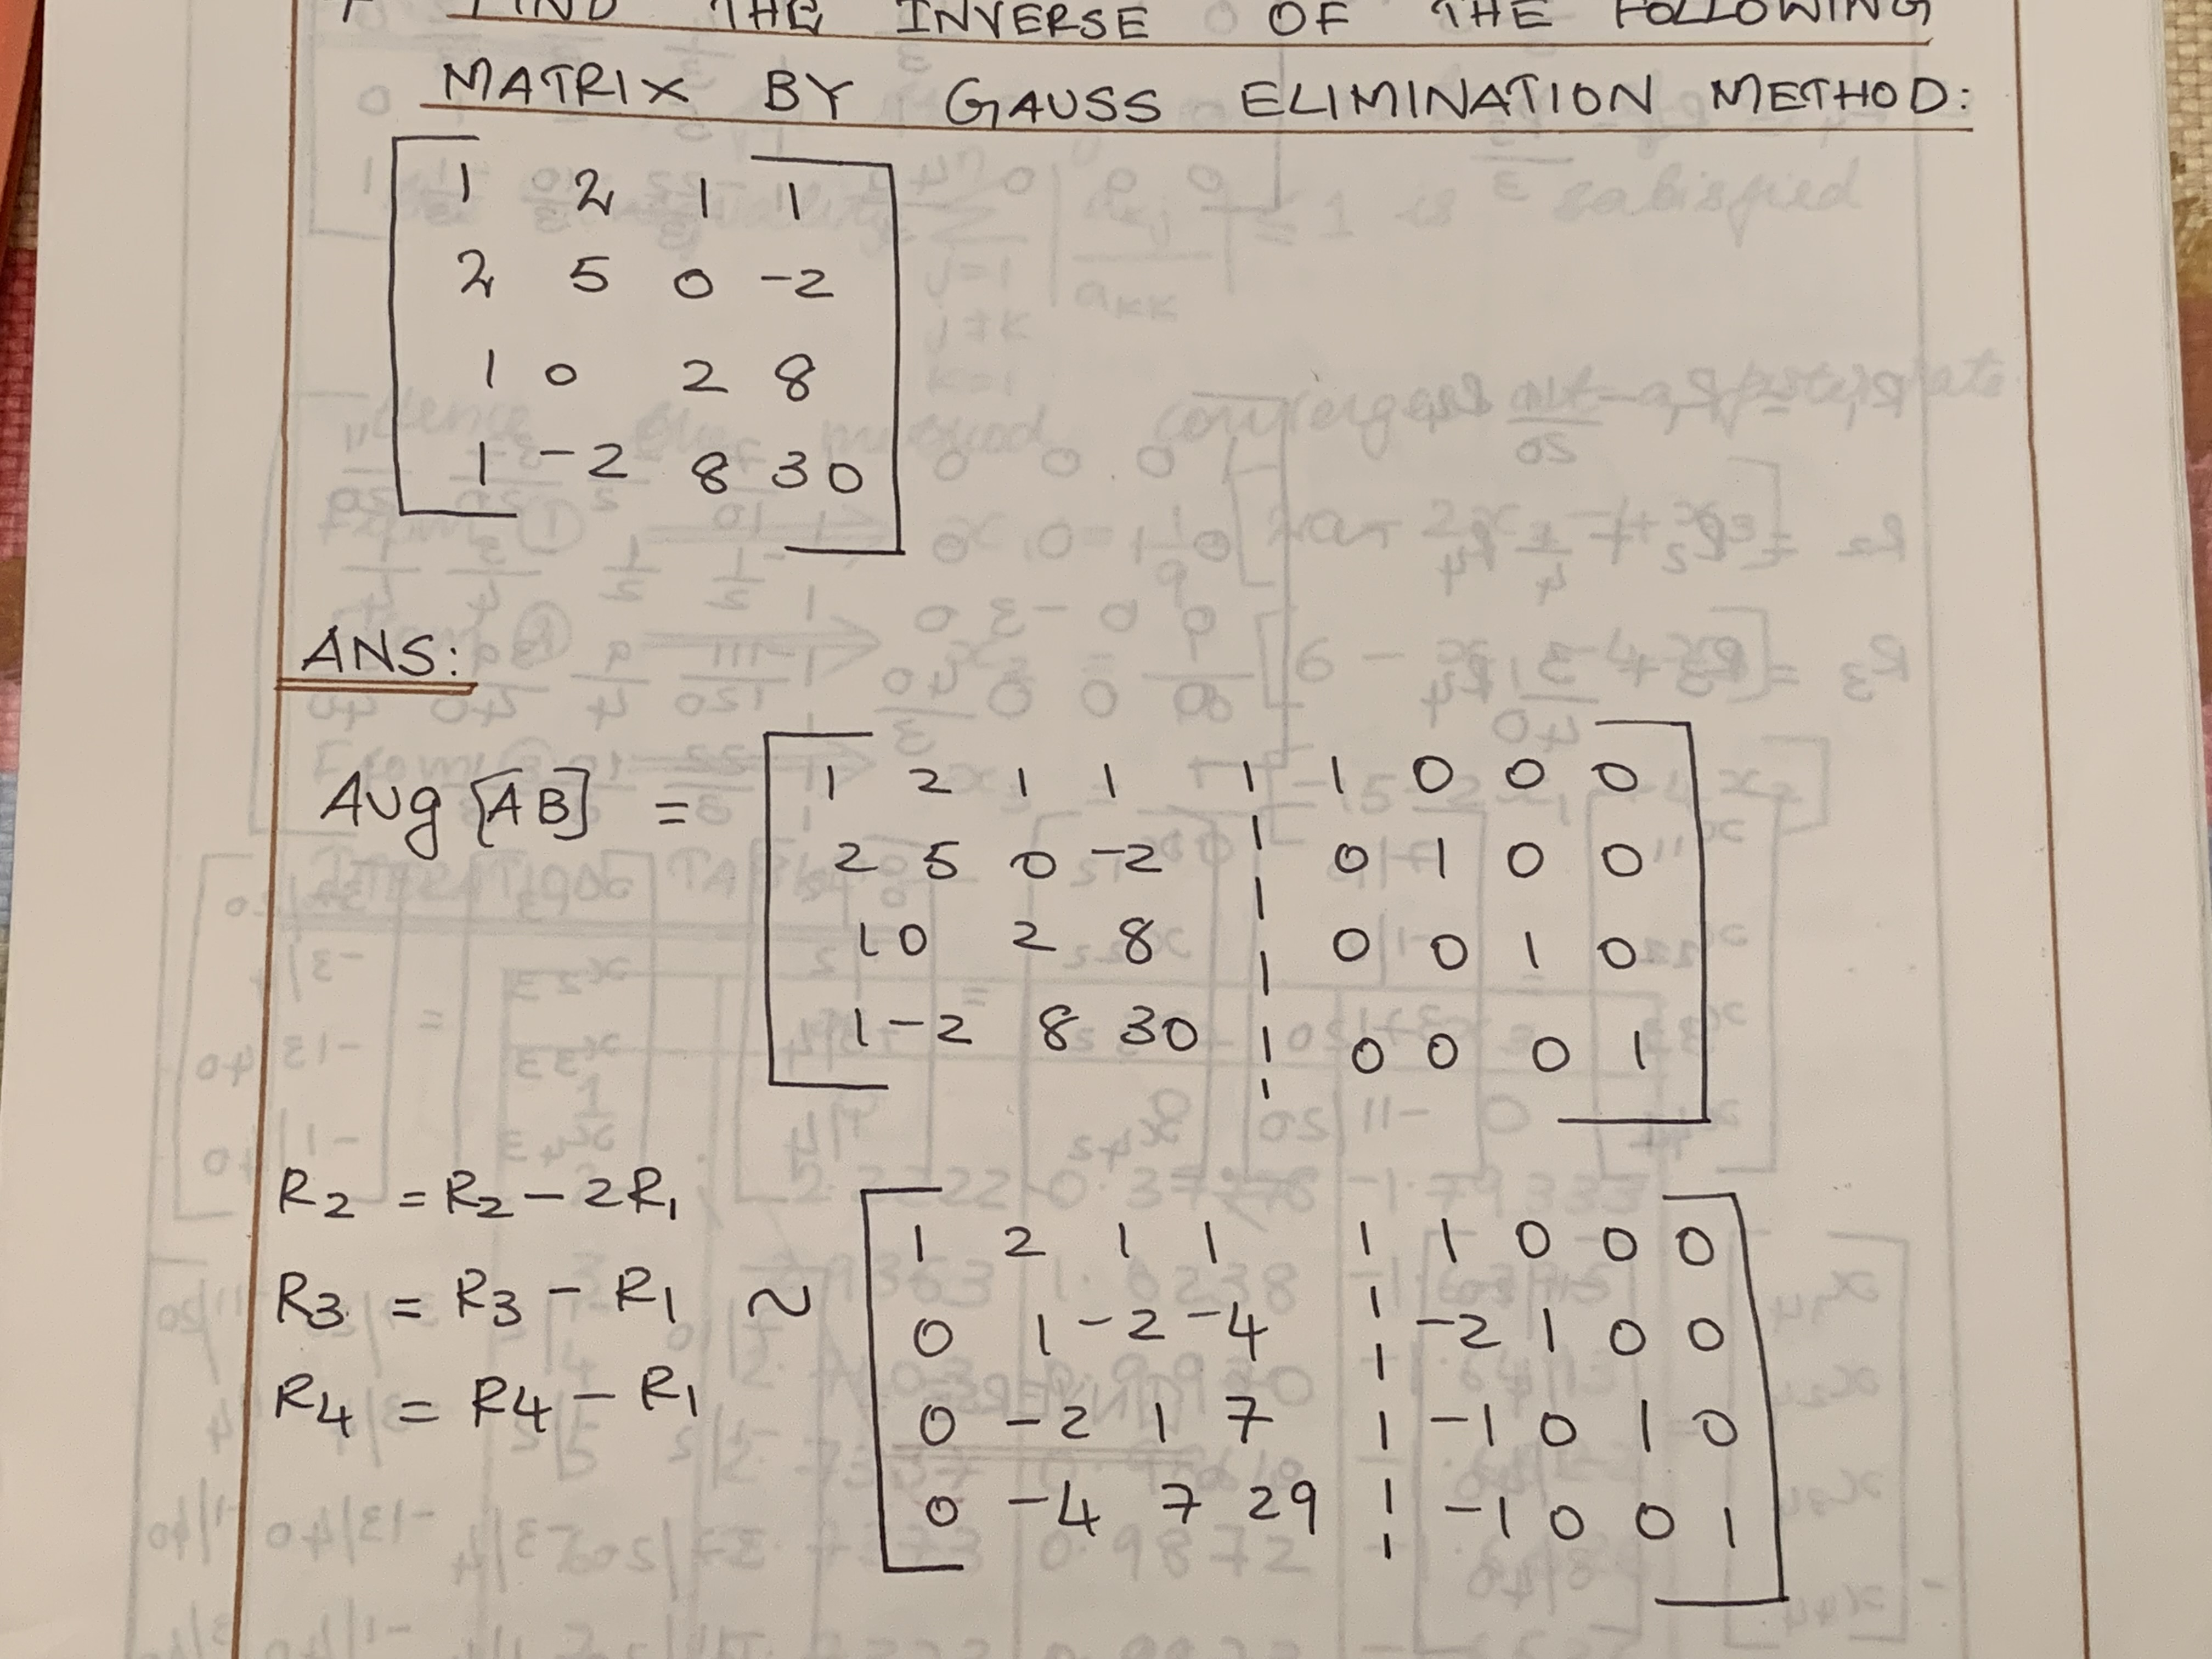 finding-inverse-matrix-gauss-elimination1